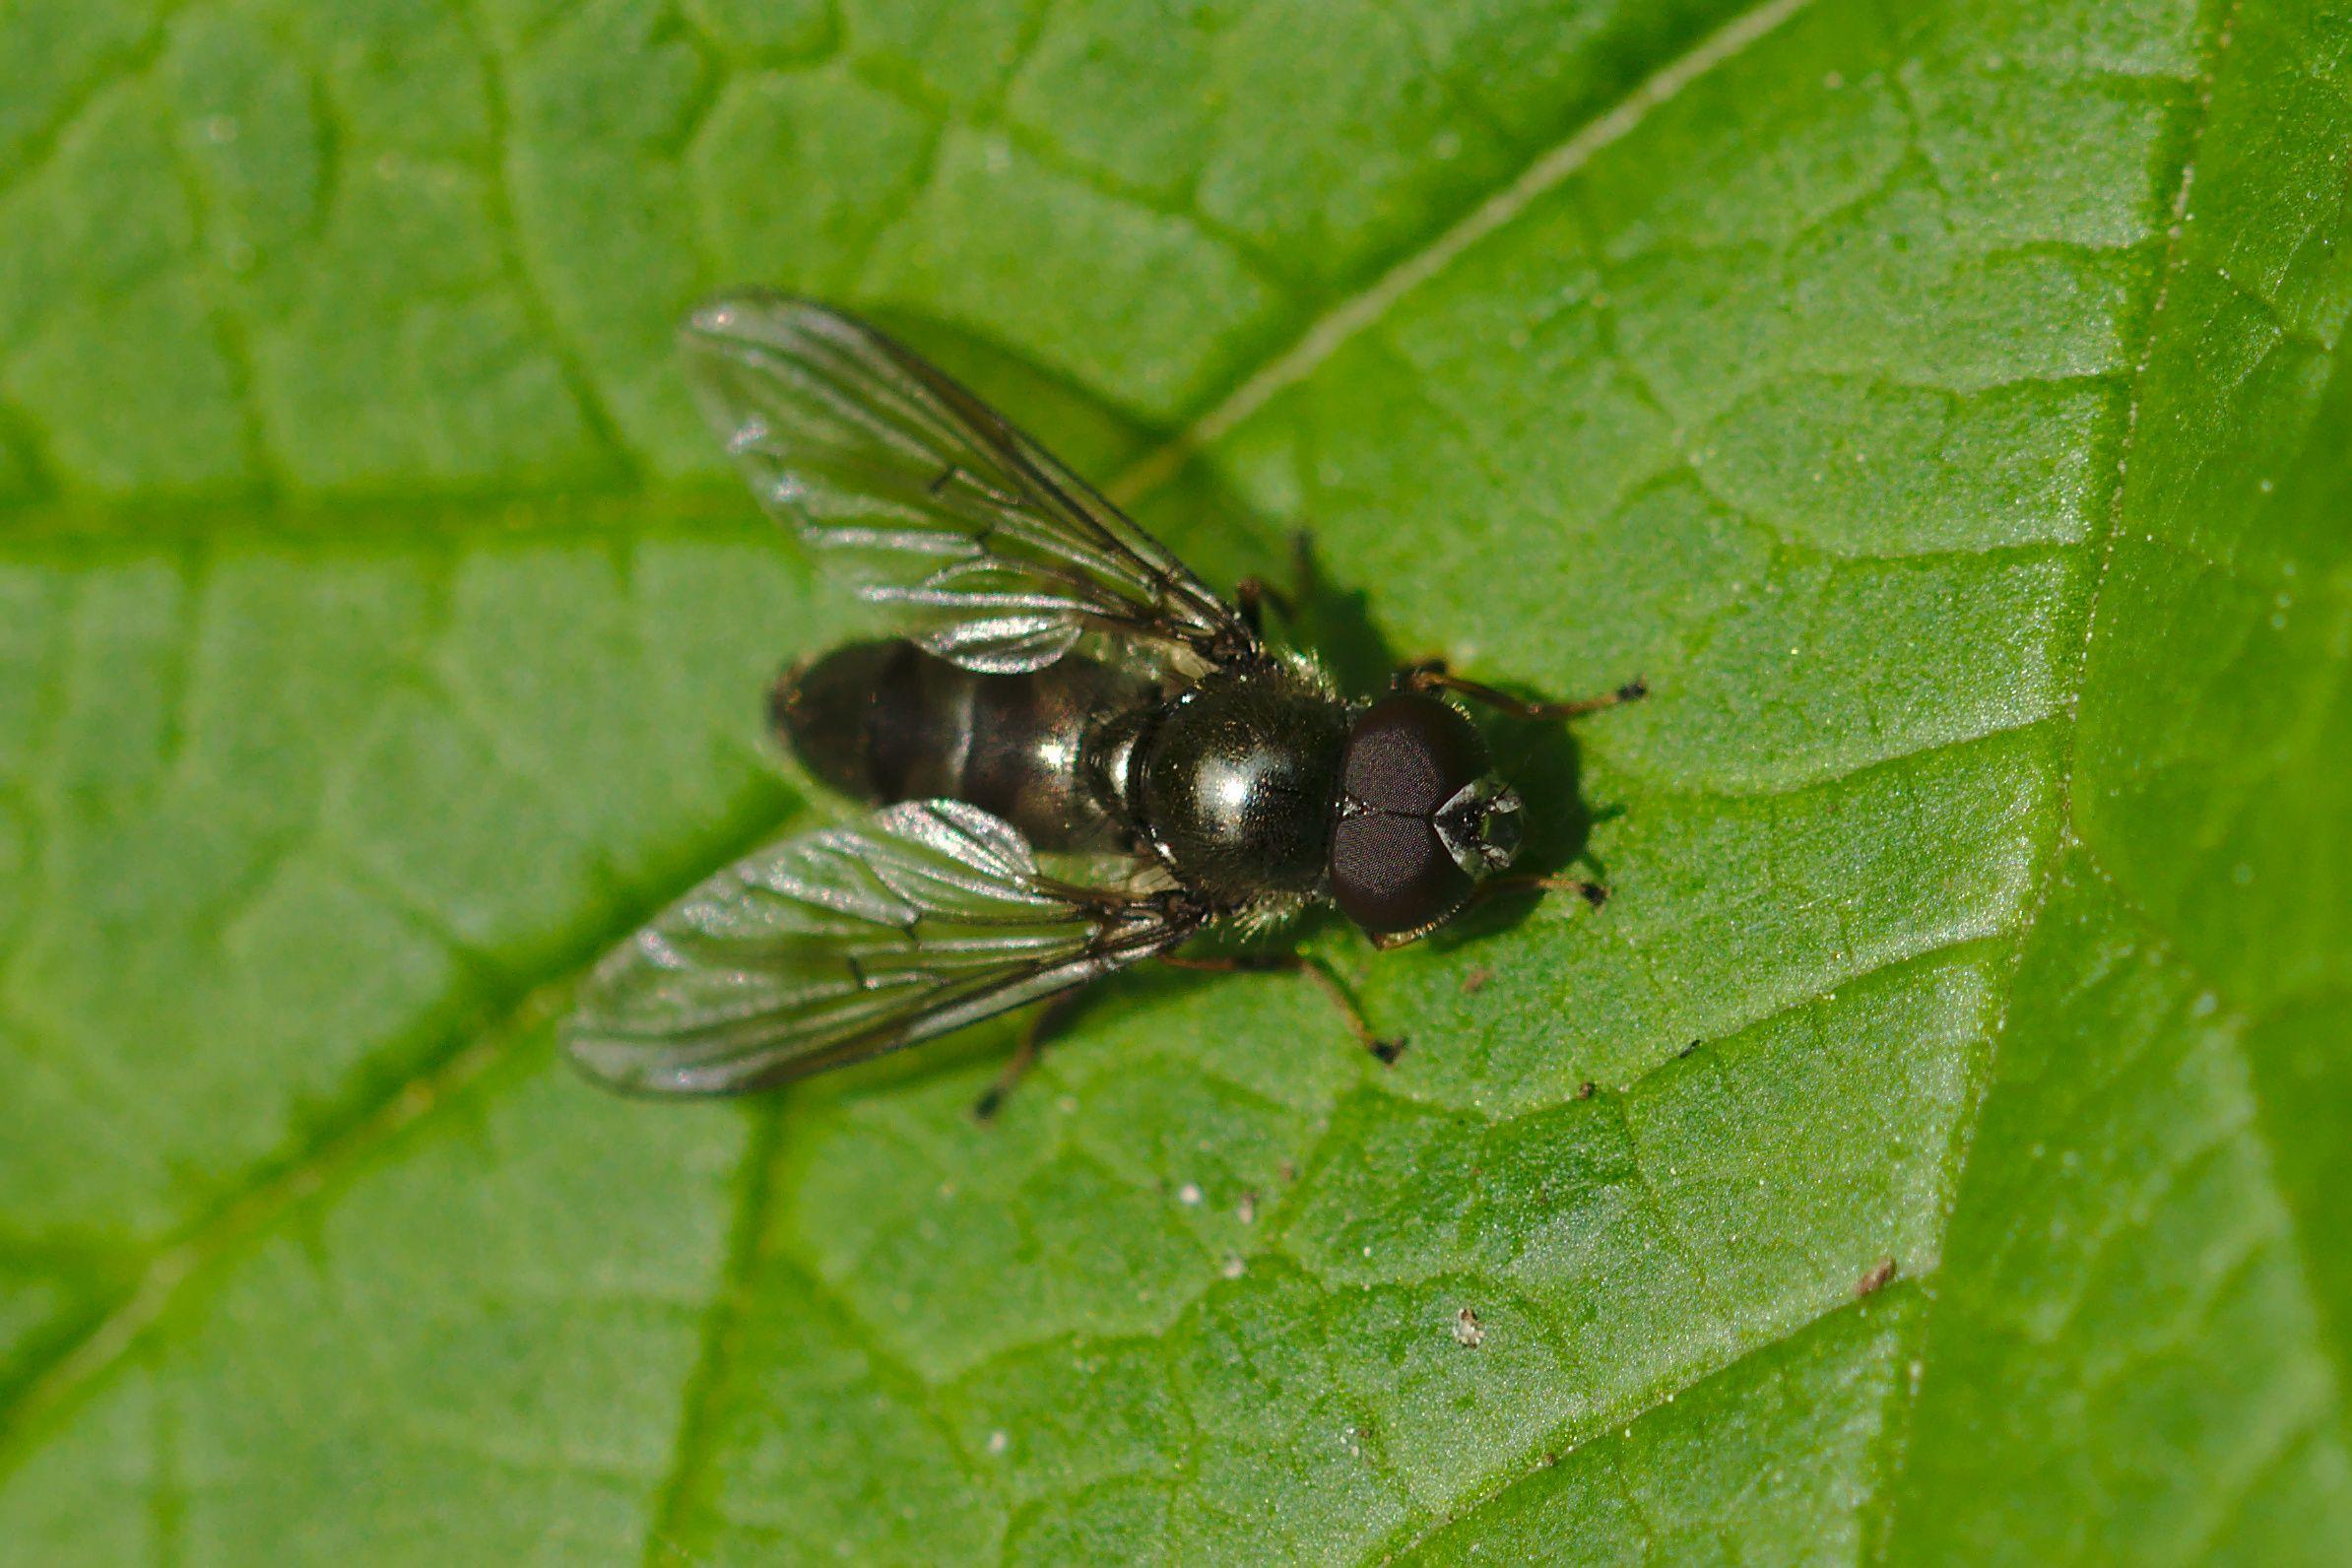 "<a href=""/cheilosia-variabilis/"" target=""_blank"" rel=""noopener noreferrer""><i>Cheilosia variabilis</i> (Gemeine Erzschwebfliege)</a>"